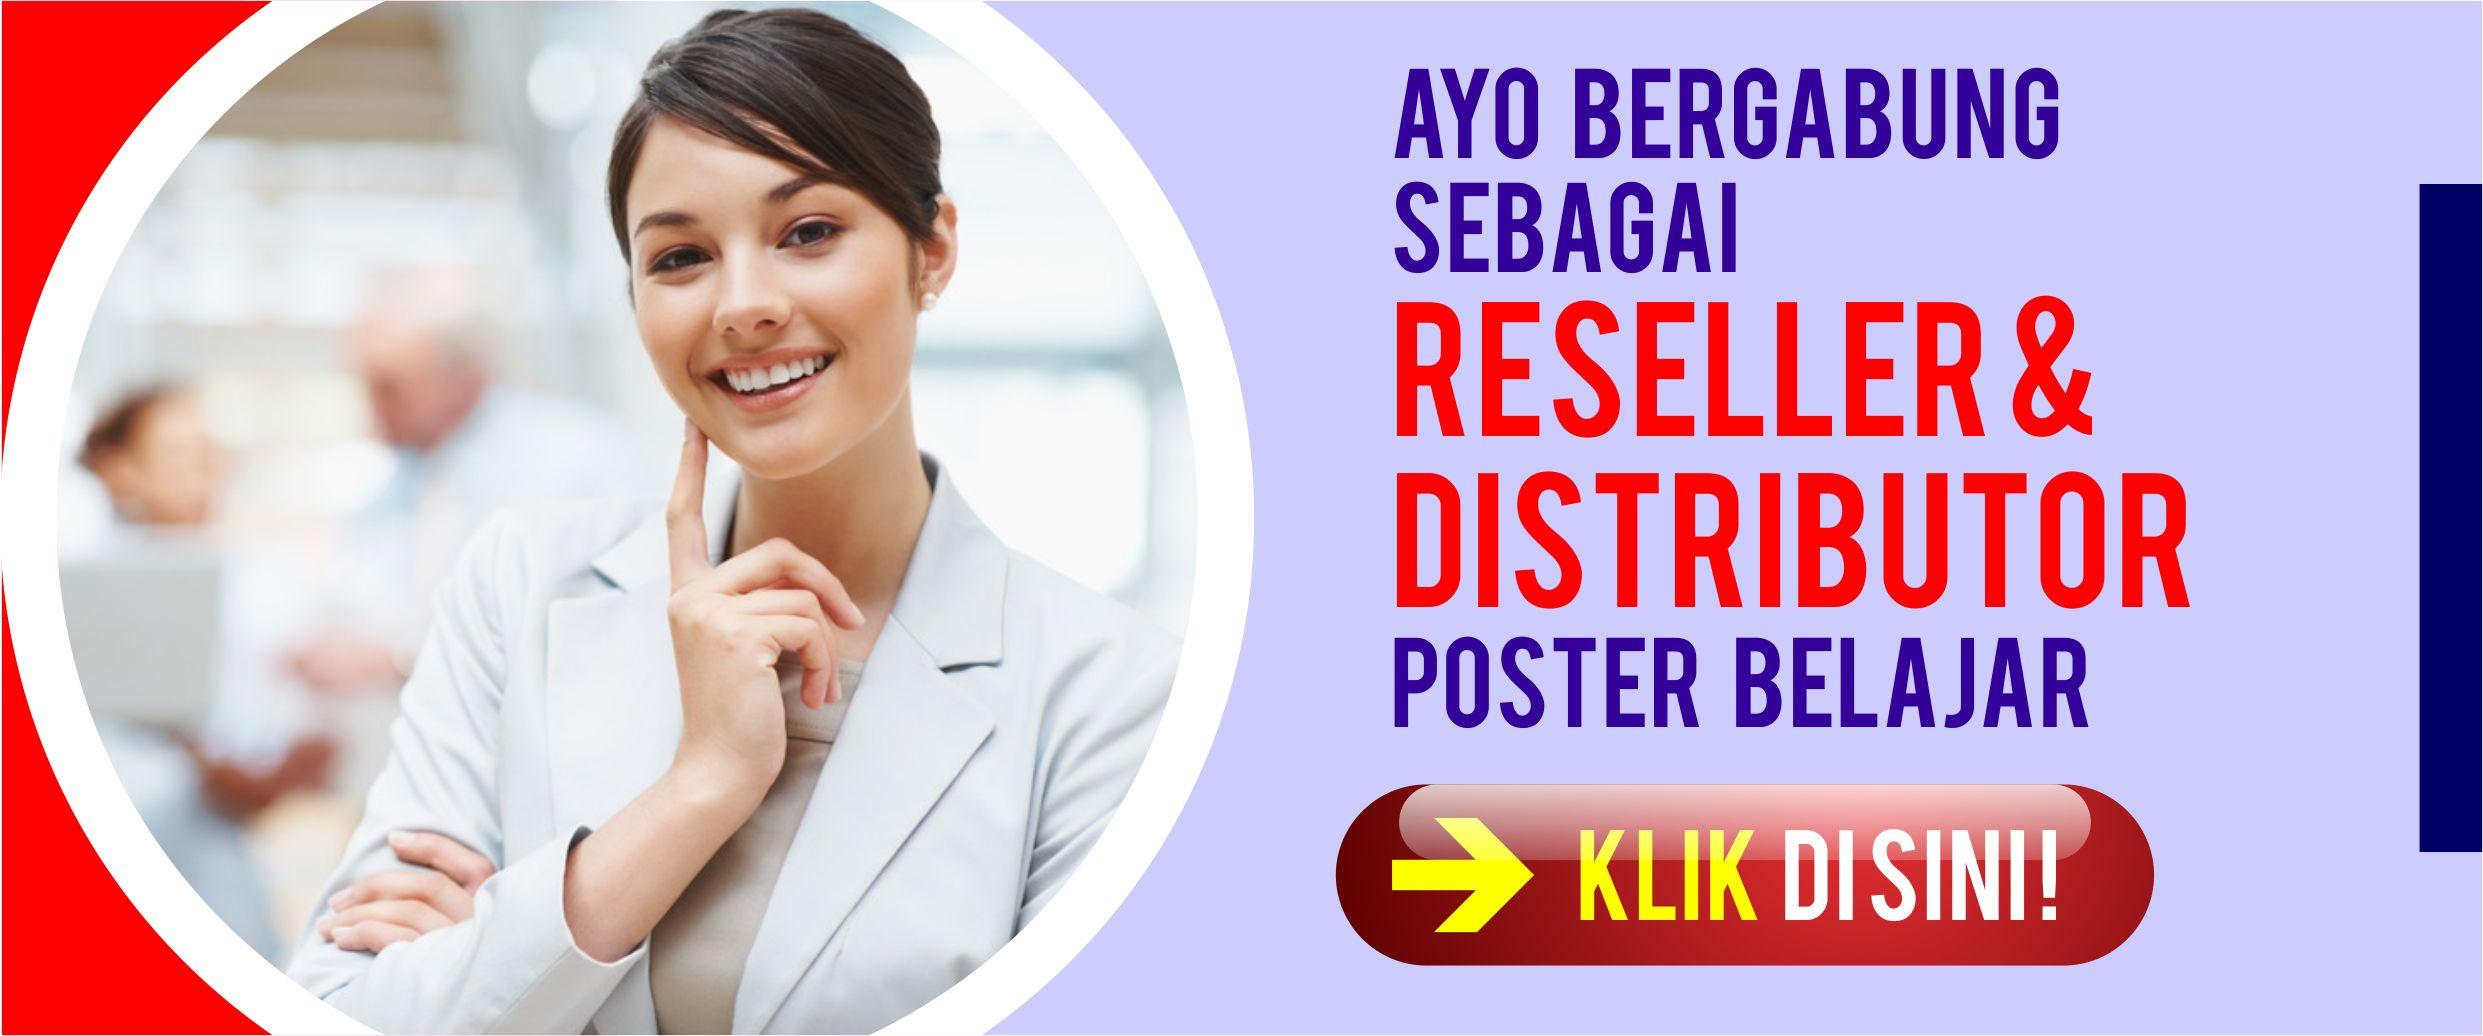 Bisnis dengan Modal Kecil | Peluang Usaha / Bisnis Online ...